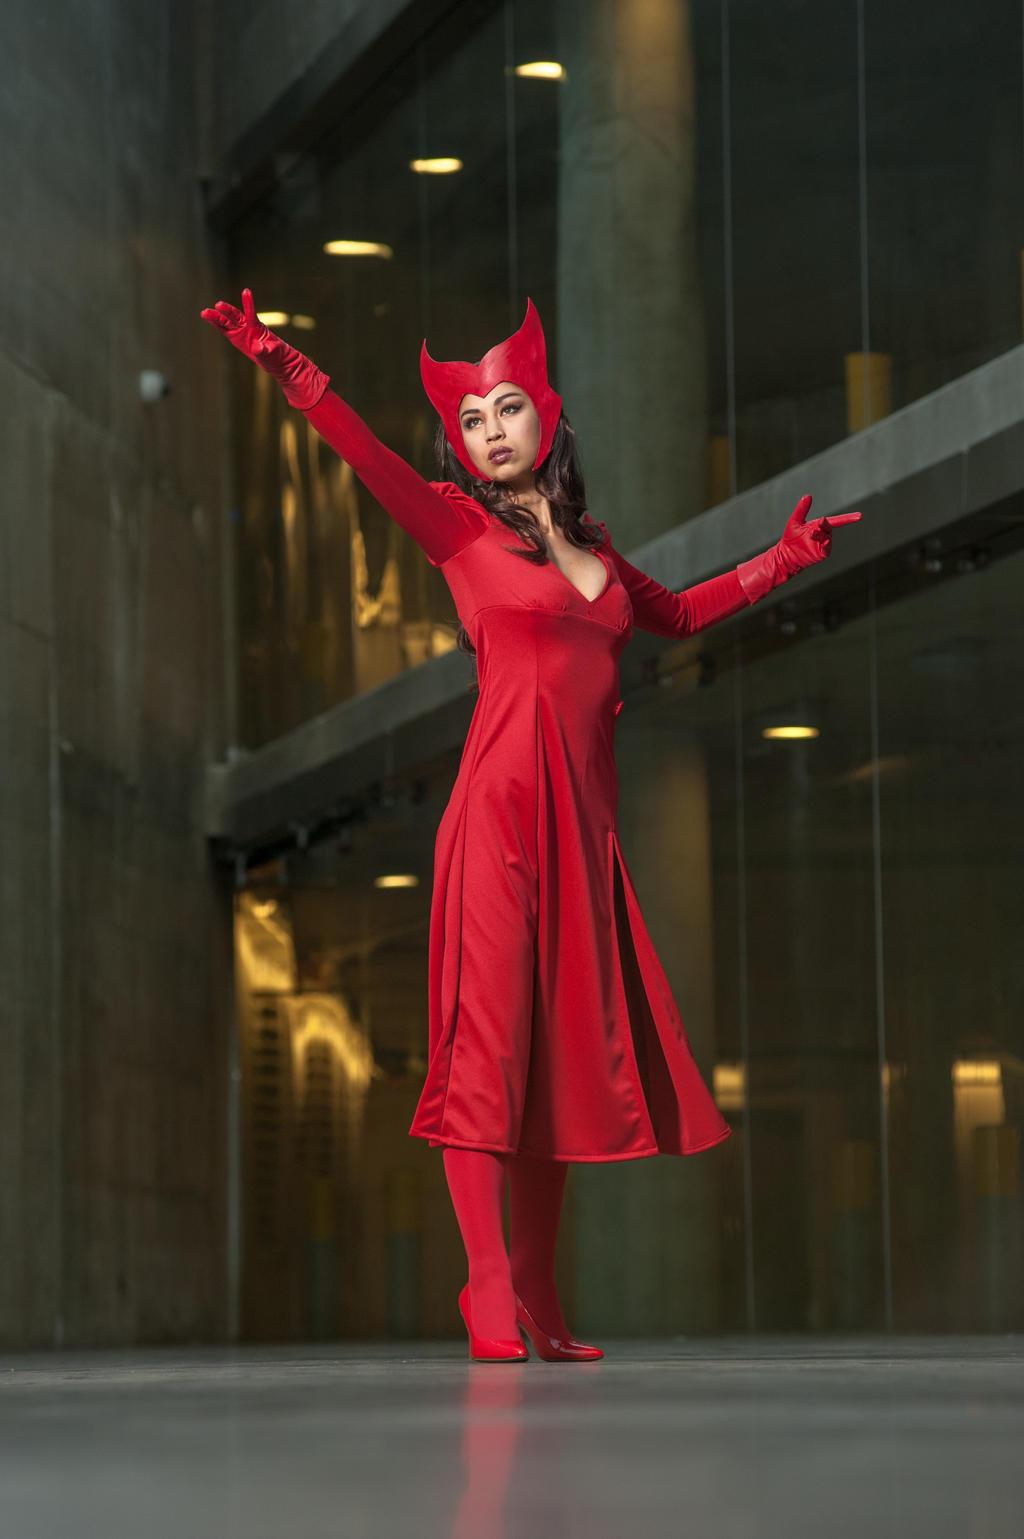 Vanessa Scarlet Witch 1a By Jagged Eye On Deviantart